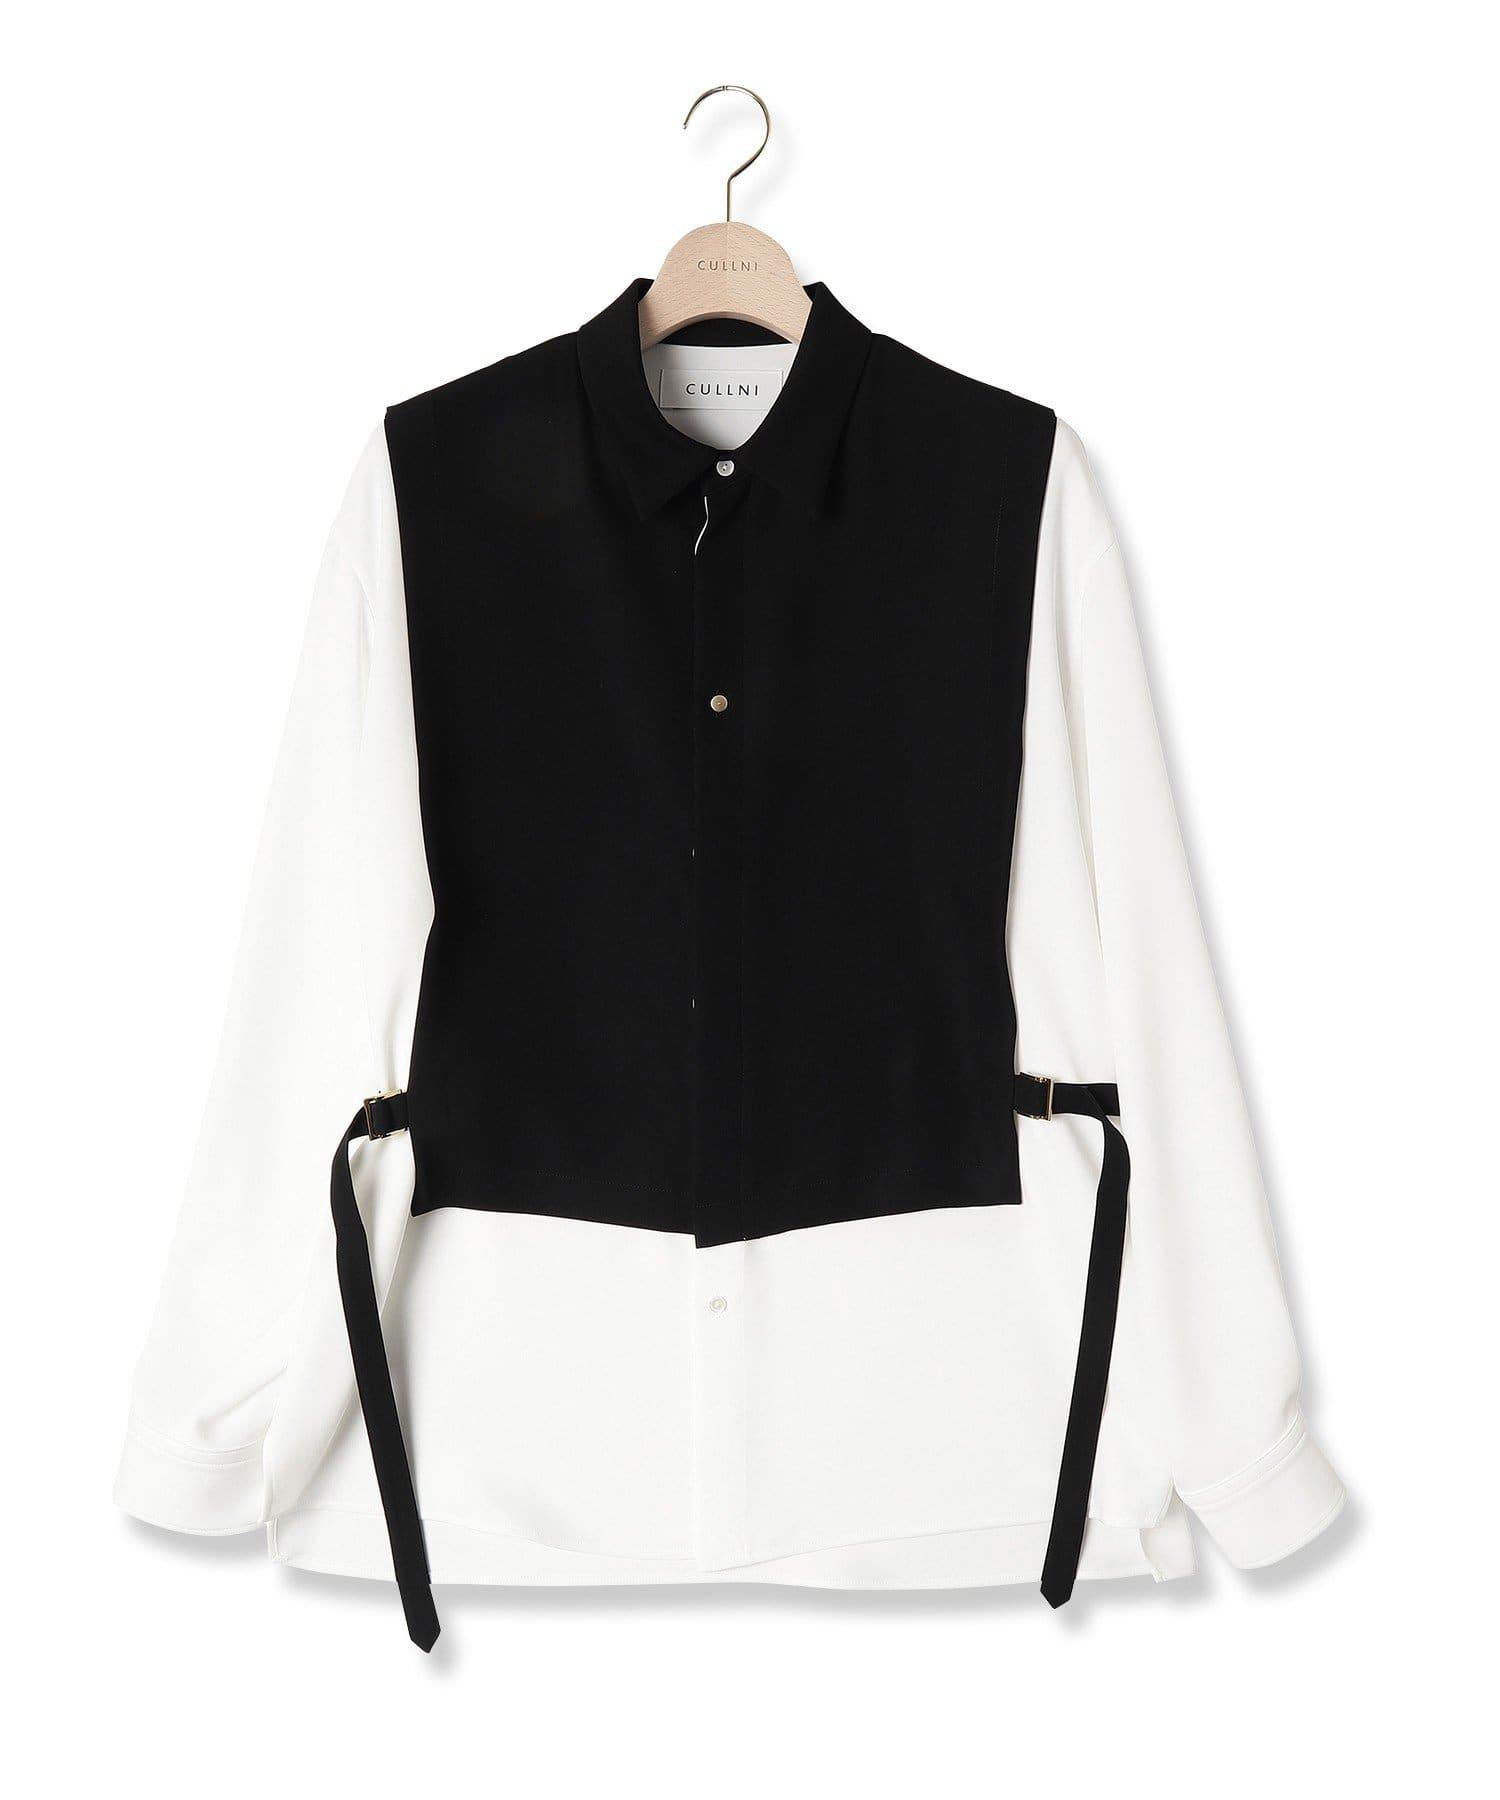 Lui's(ルイス) 【CULLNI/クルニ】 レイヤードシャツ